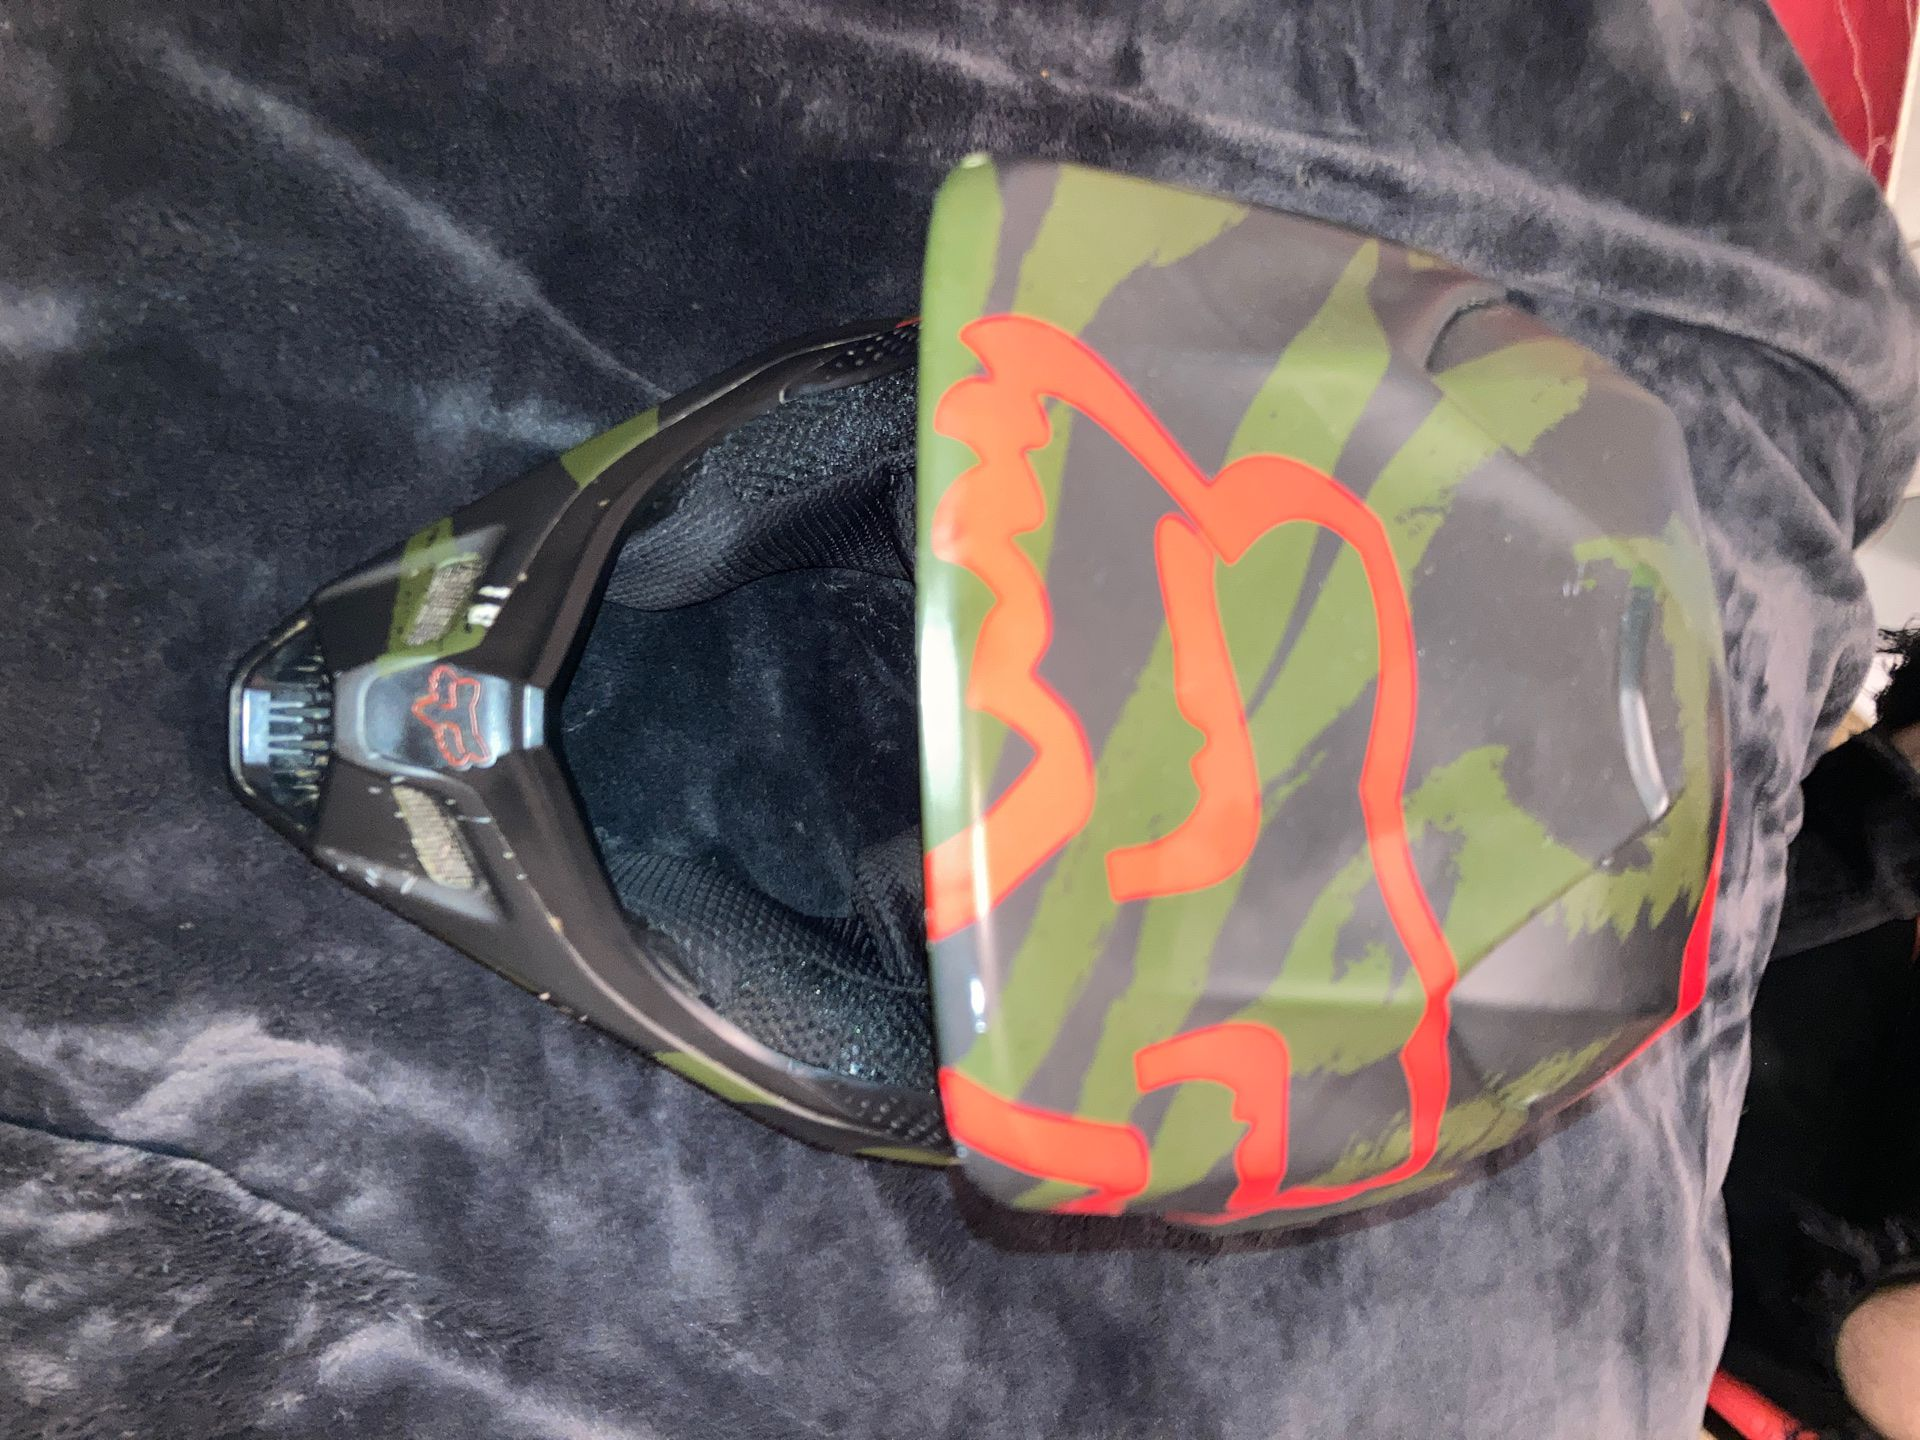 Photo Fox helmet for motorcycles